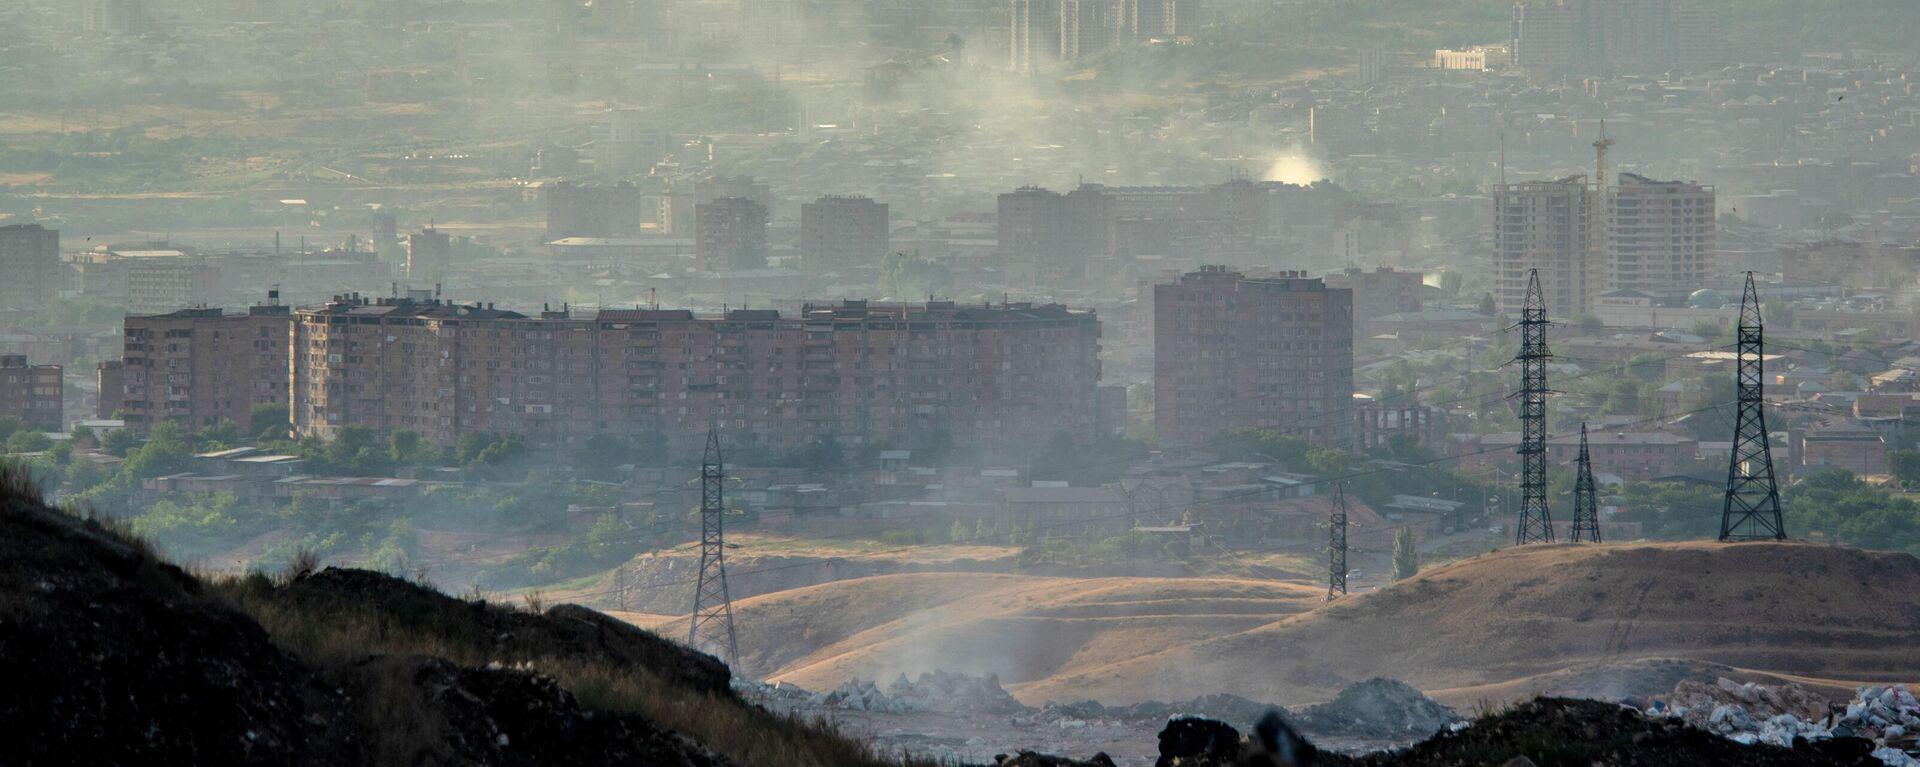 Вид на город с мусорной свалки на окраине Еревана - Sputnik Азербайджан, 1920, 10.10.2021